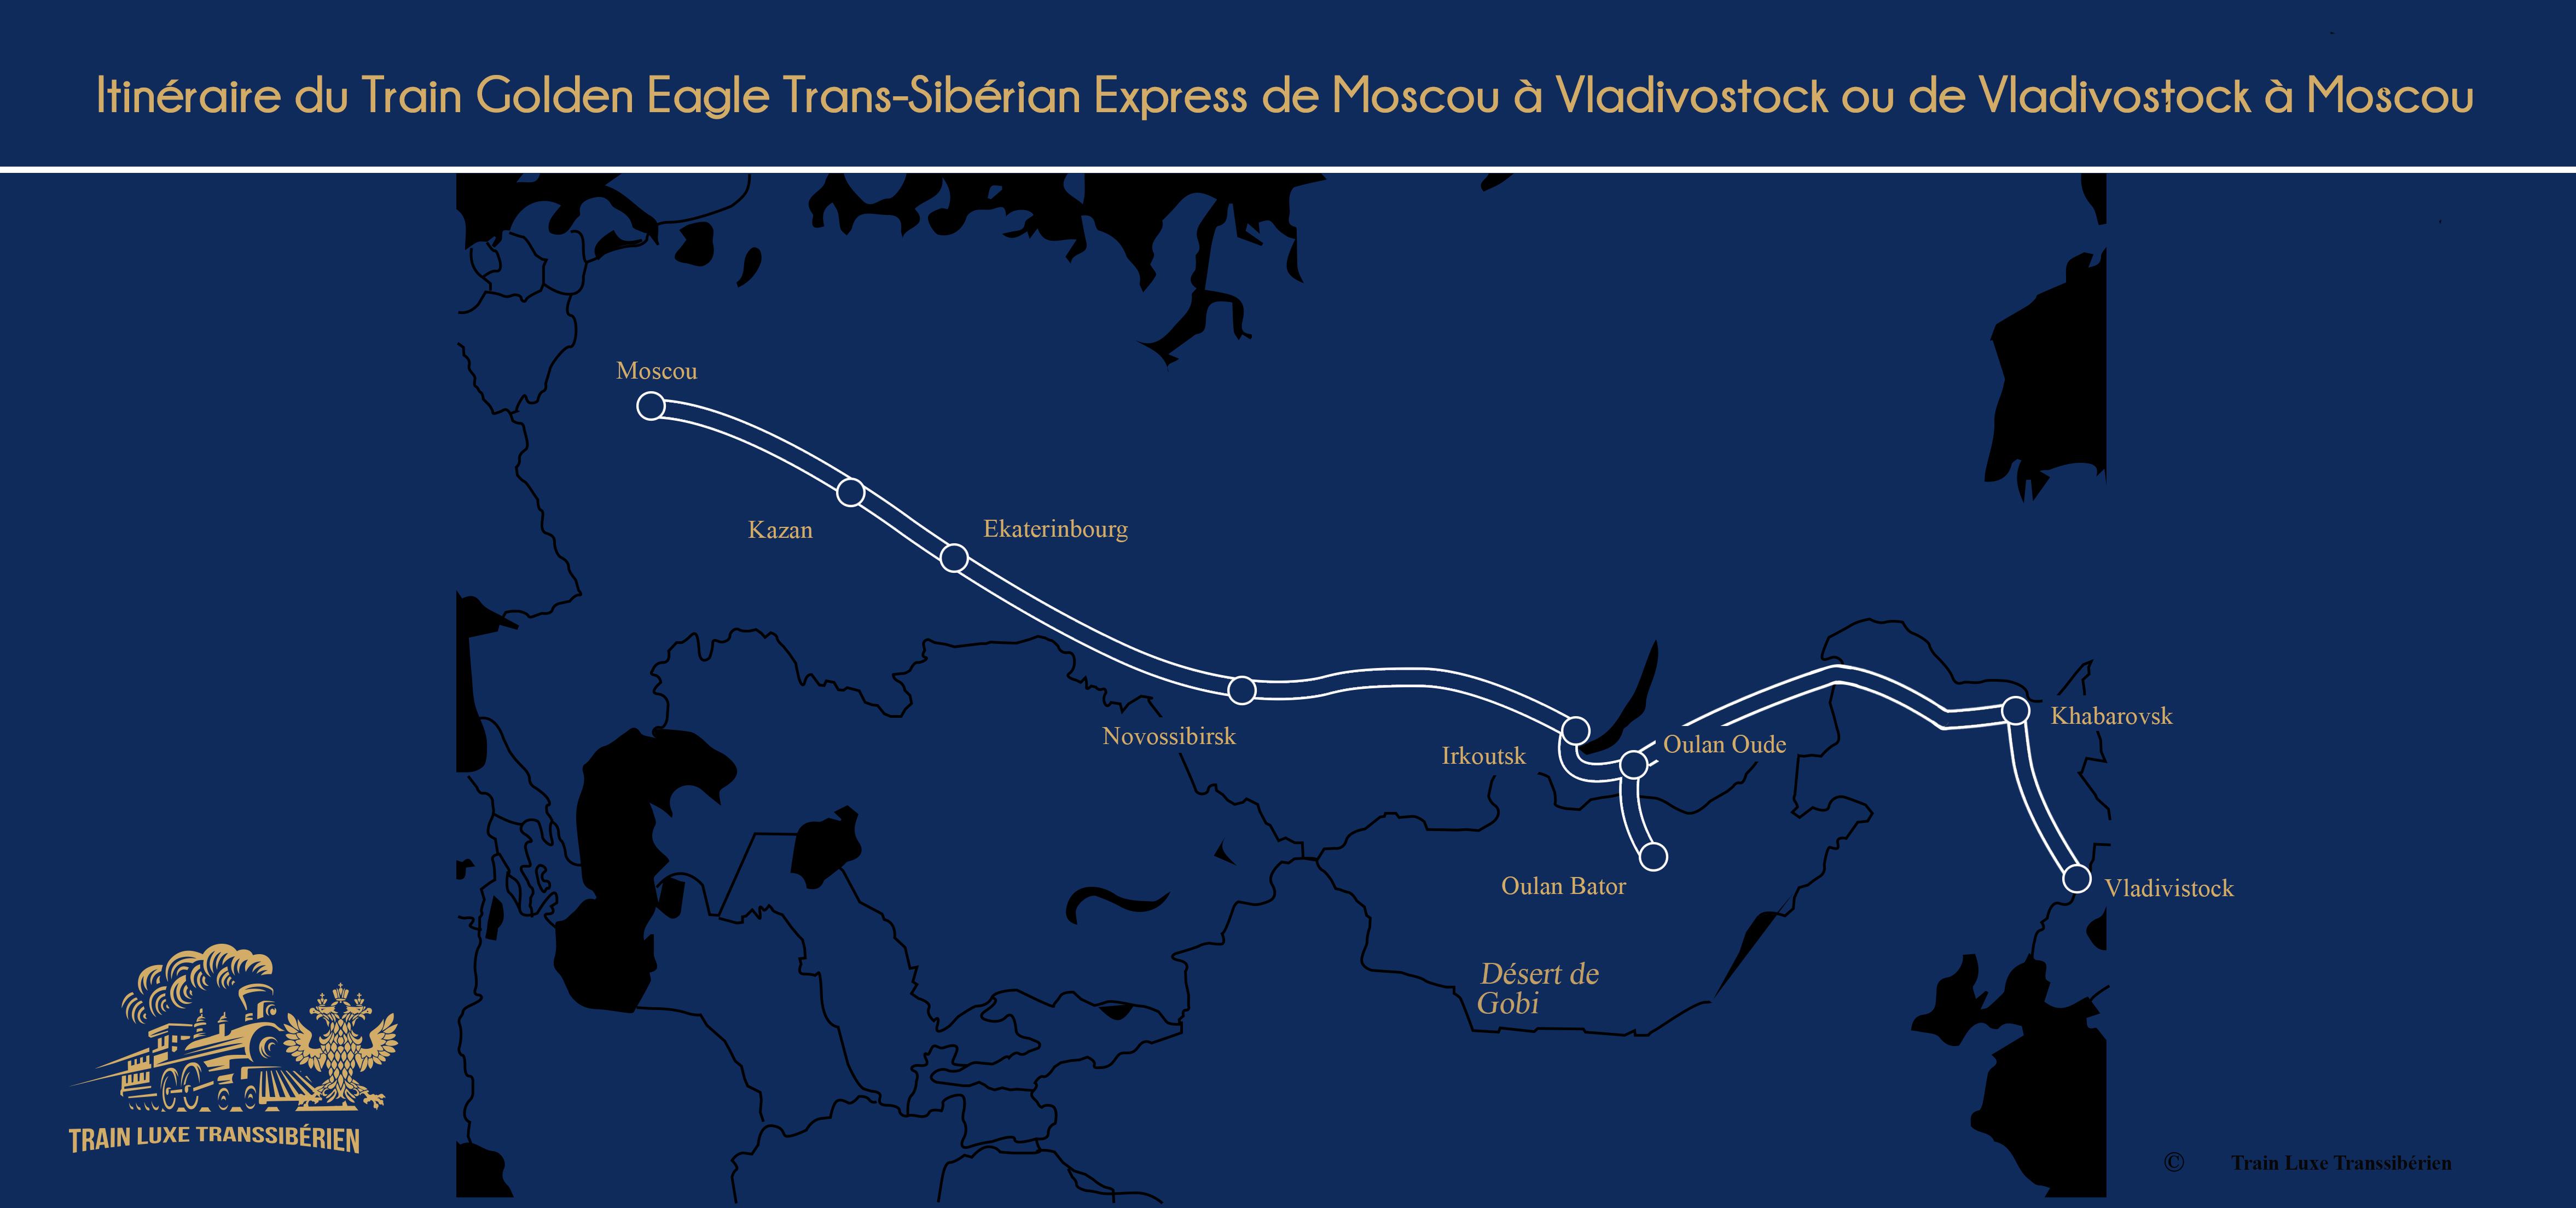 tinéraire-du-Train-Golden-Eagle-Trans-Sibérian-Express-de-Moscou-à-Vladivostock-ou-de-Vladivostock-à-Moscou